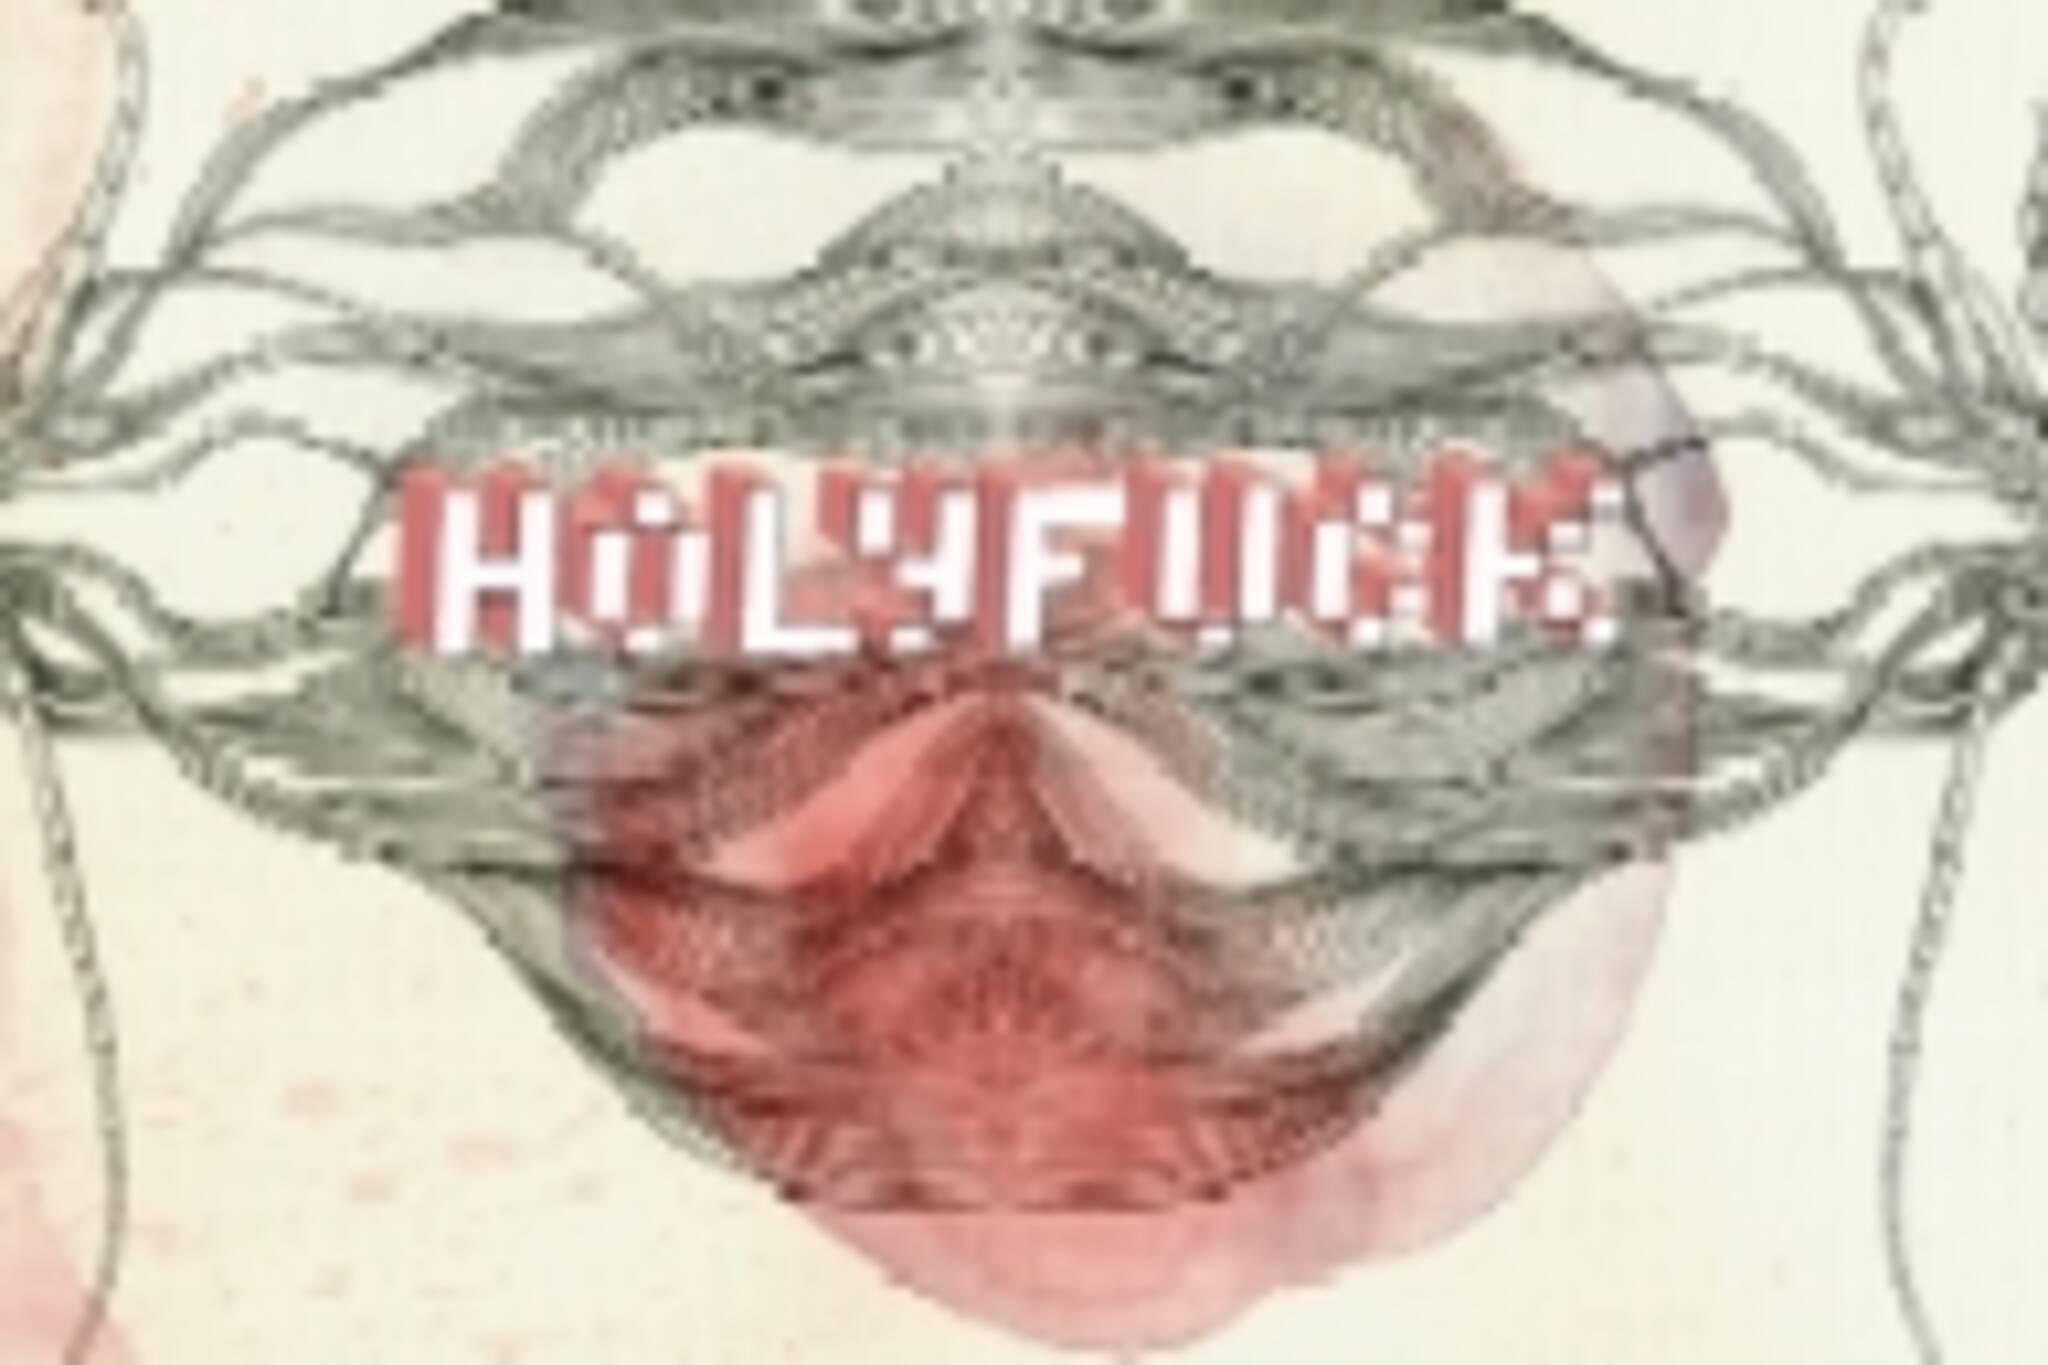 holyfuckalbumcover_Nov012005.jpg